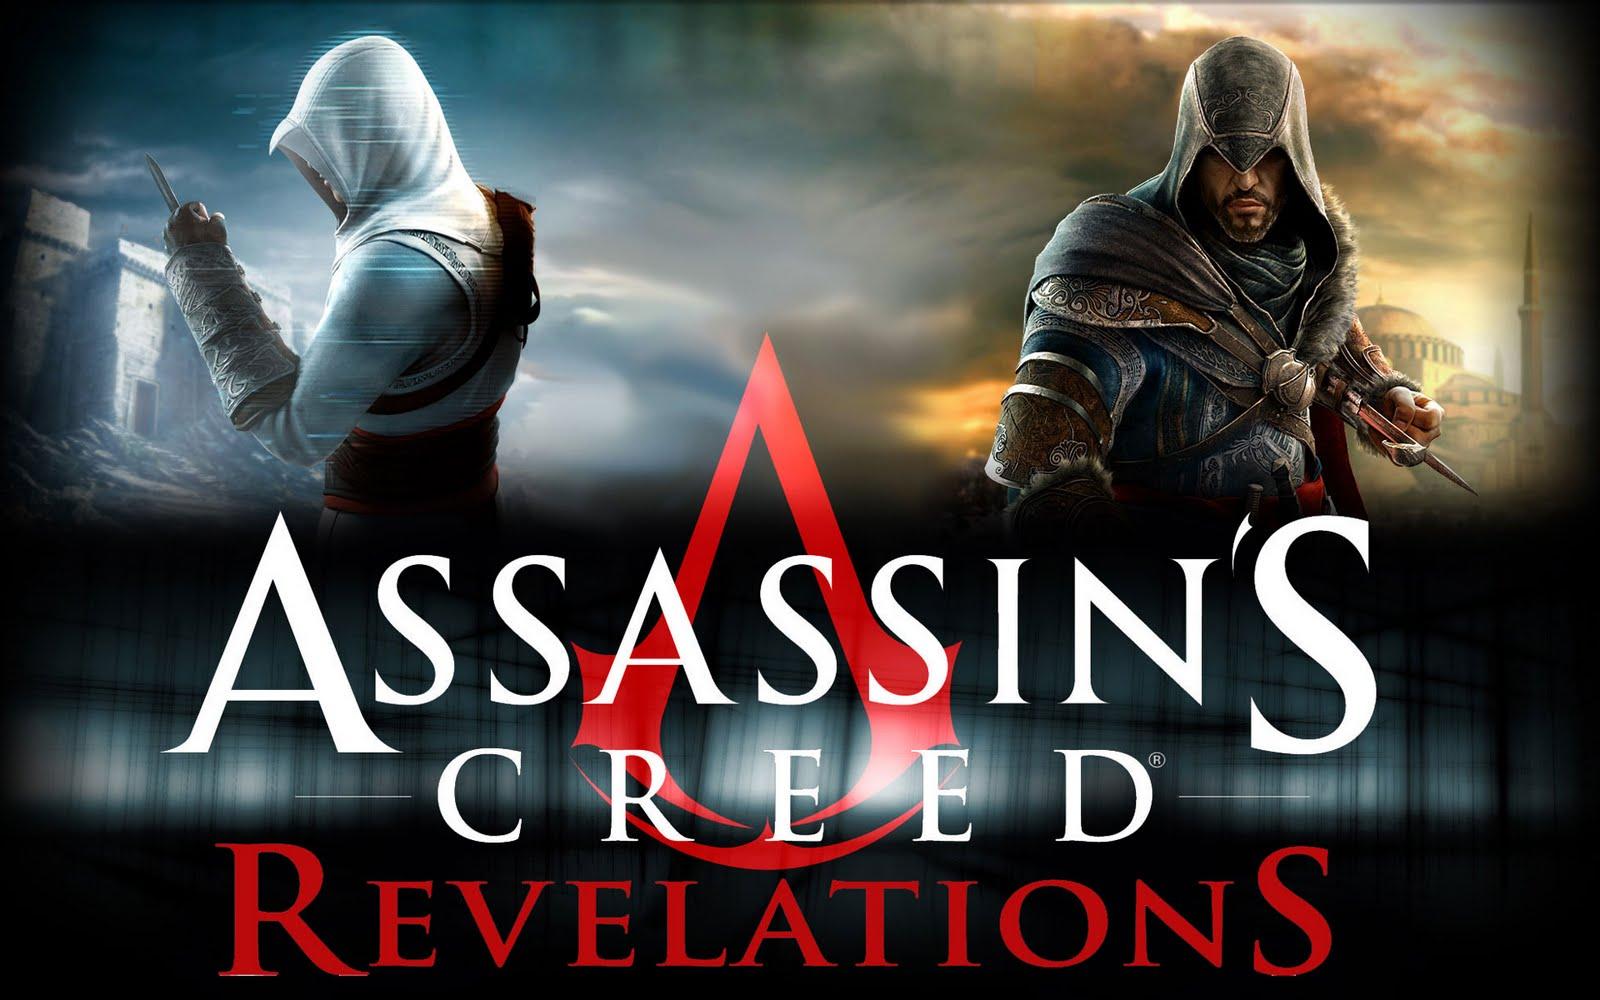 http://2.bp.blogspot.com/-bSQTfMyJ8eA/Tiie-jj6bdI/AAAAAAAAABk/vkcqb5Xm7gg/s1600/assassins_creed_revelations_wallpaper.jpg